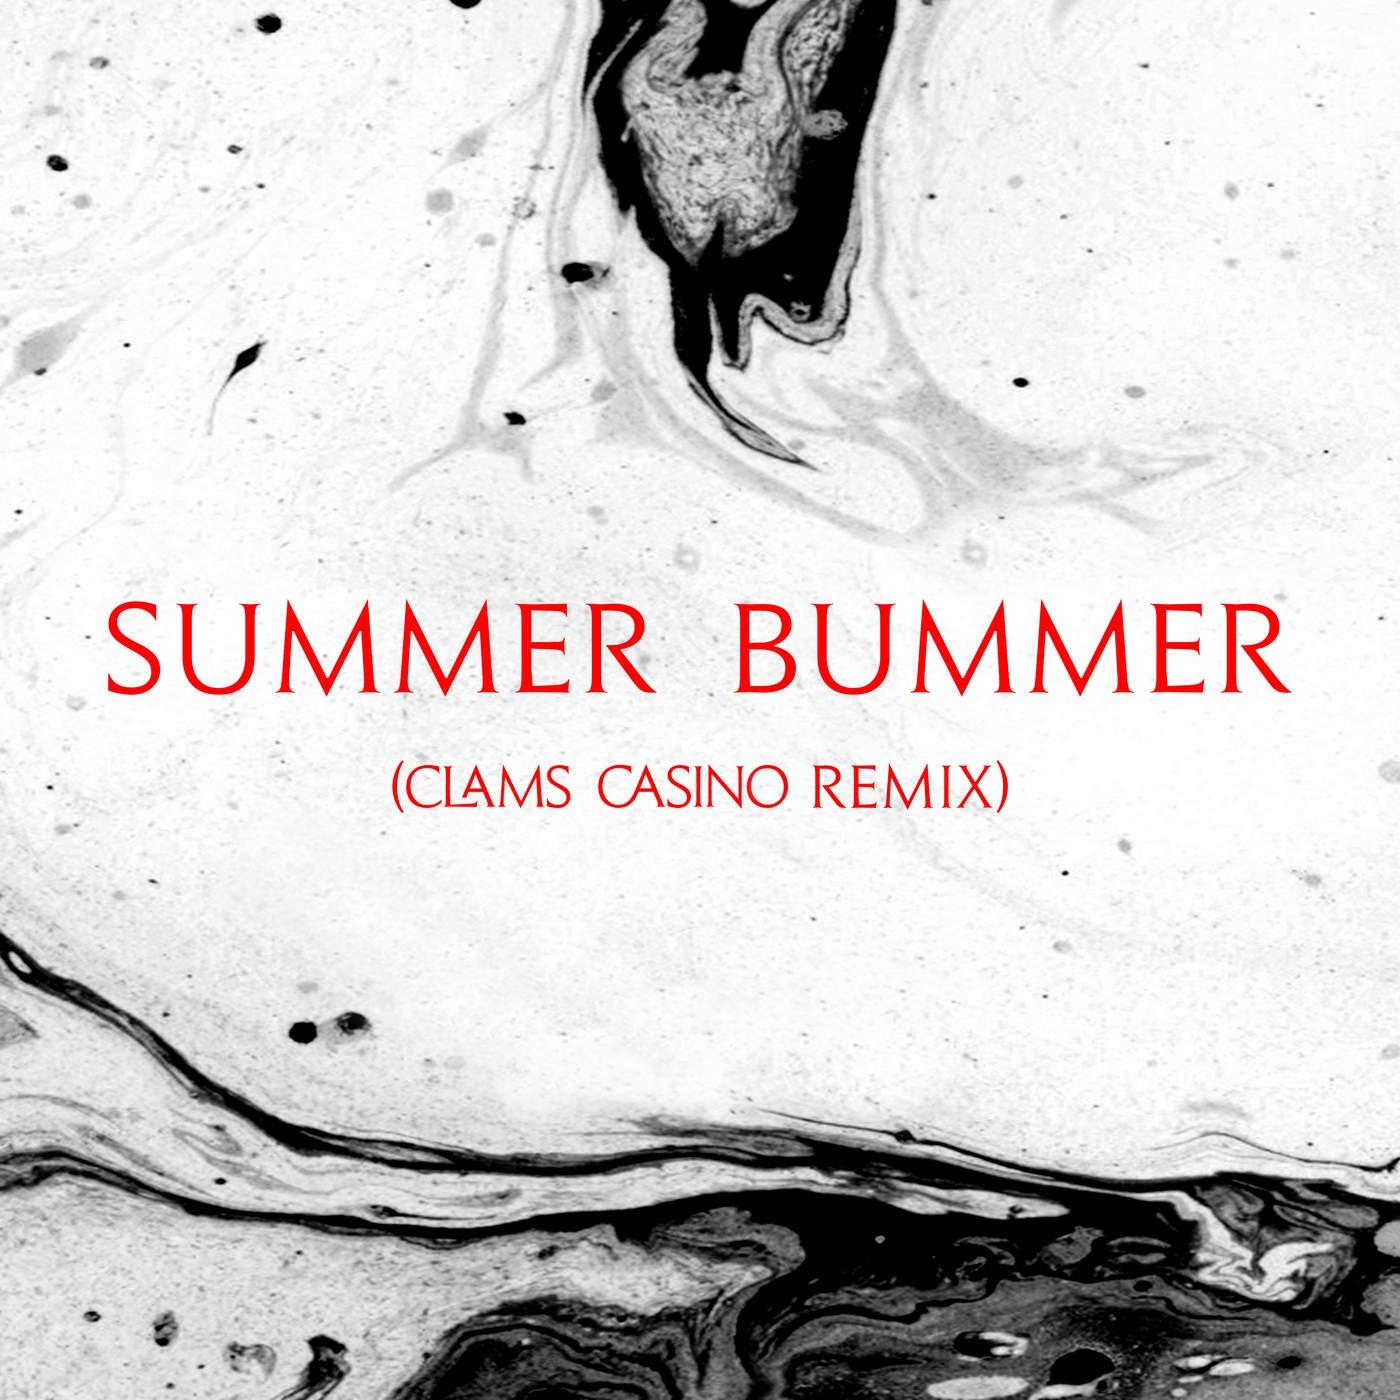 Lana Del Rey & ASAP Rocky & Playboi Carti - Summer Bummer (Clams Casino Remix)